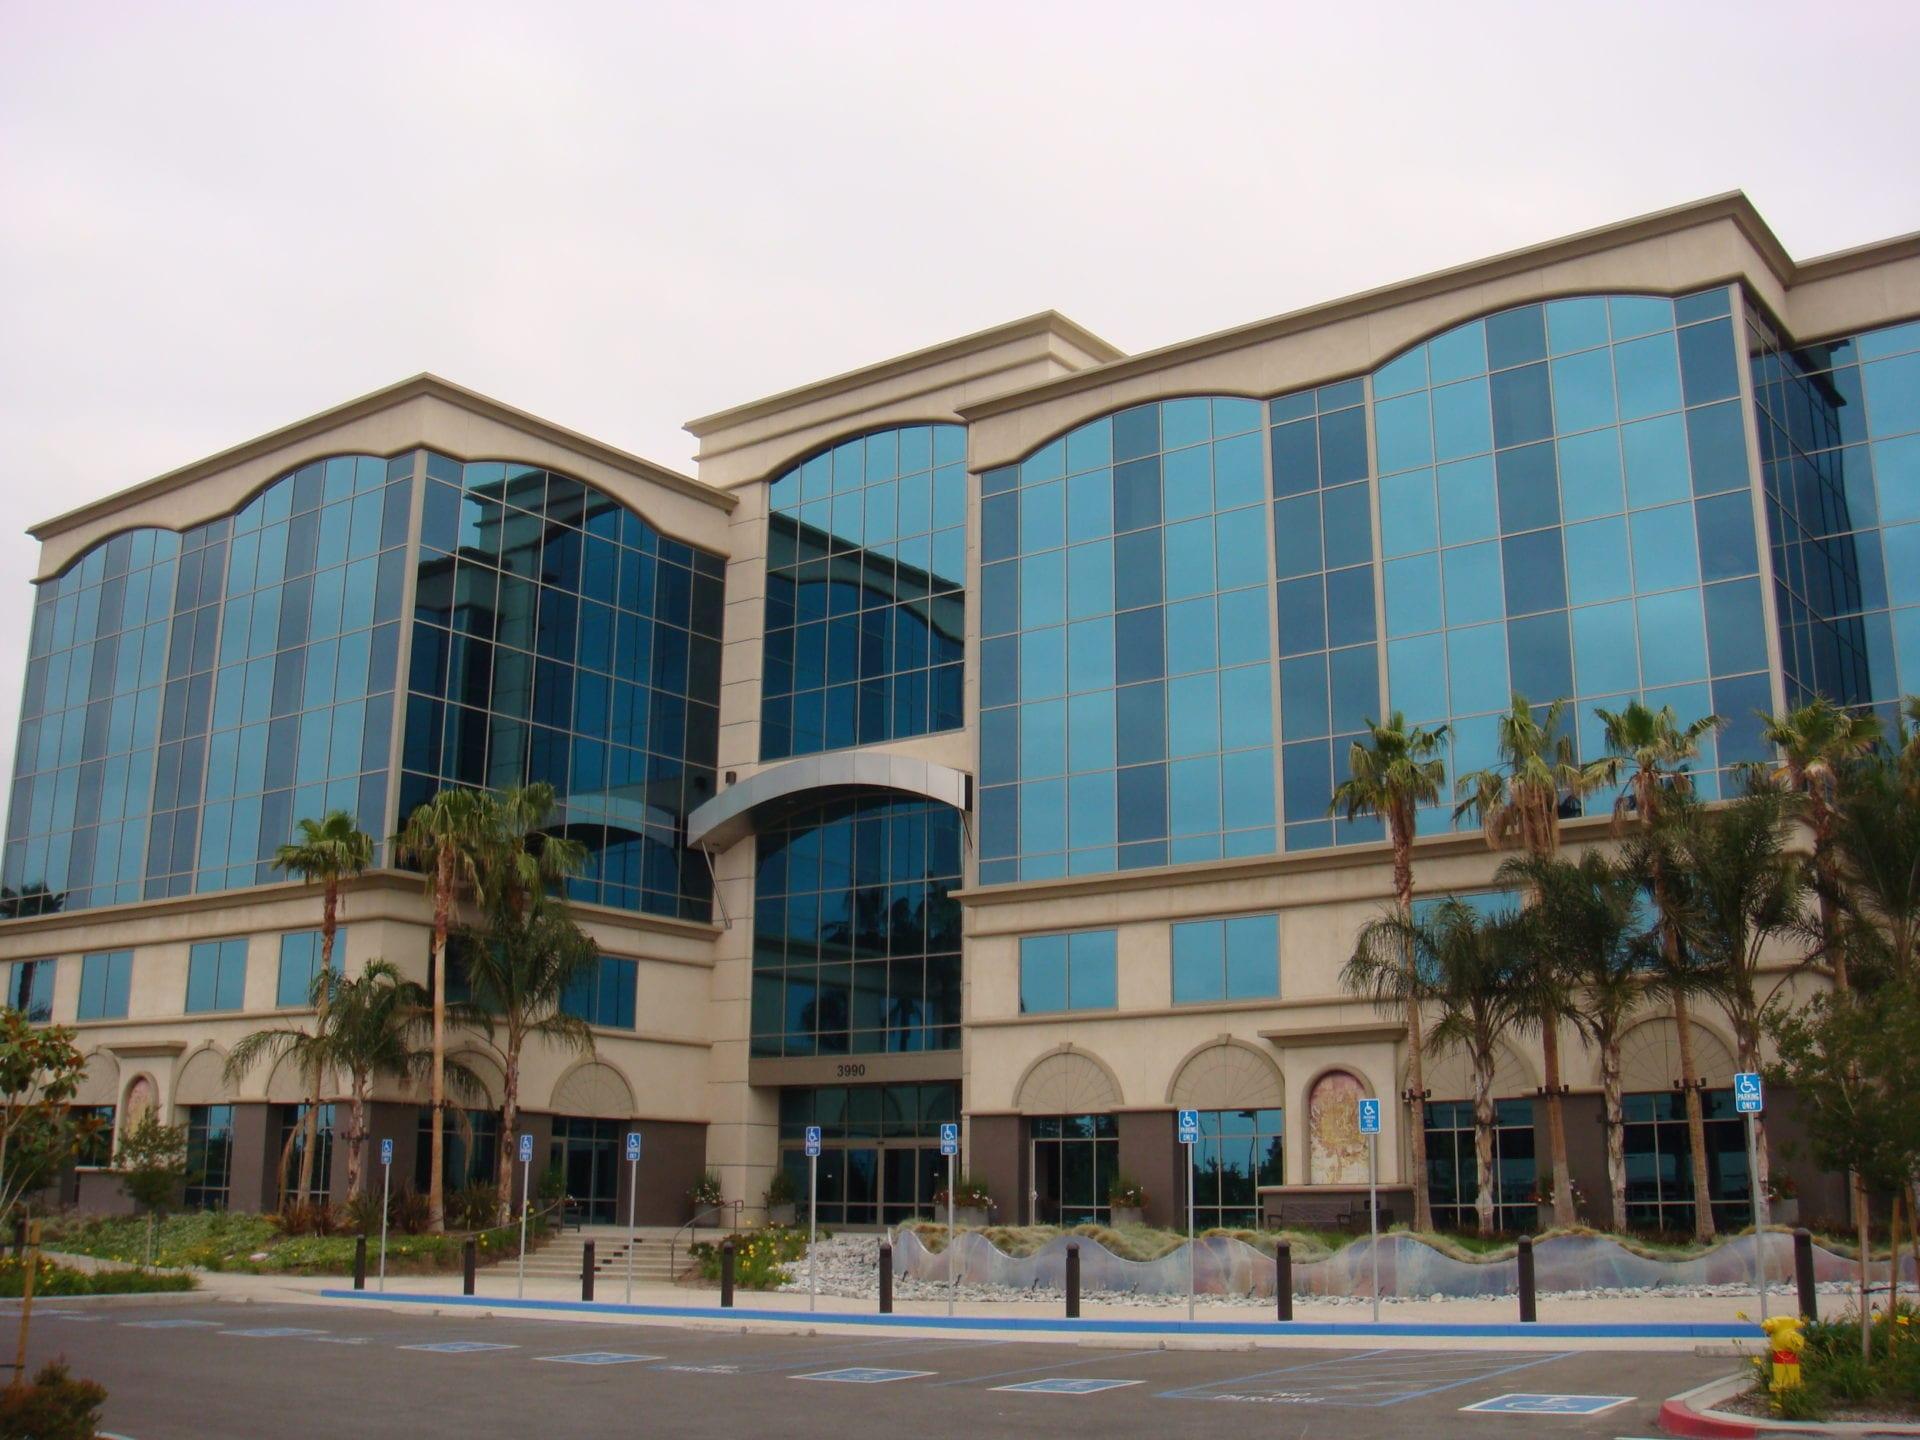 KAR Construction Inc